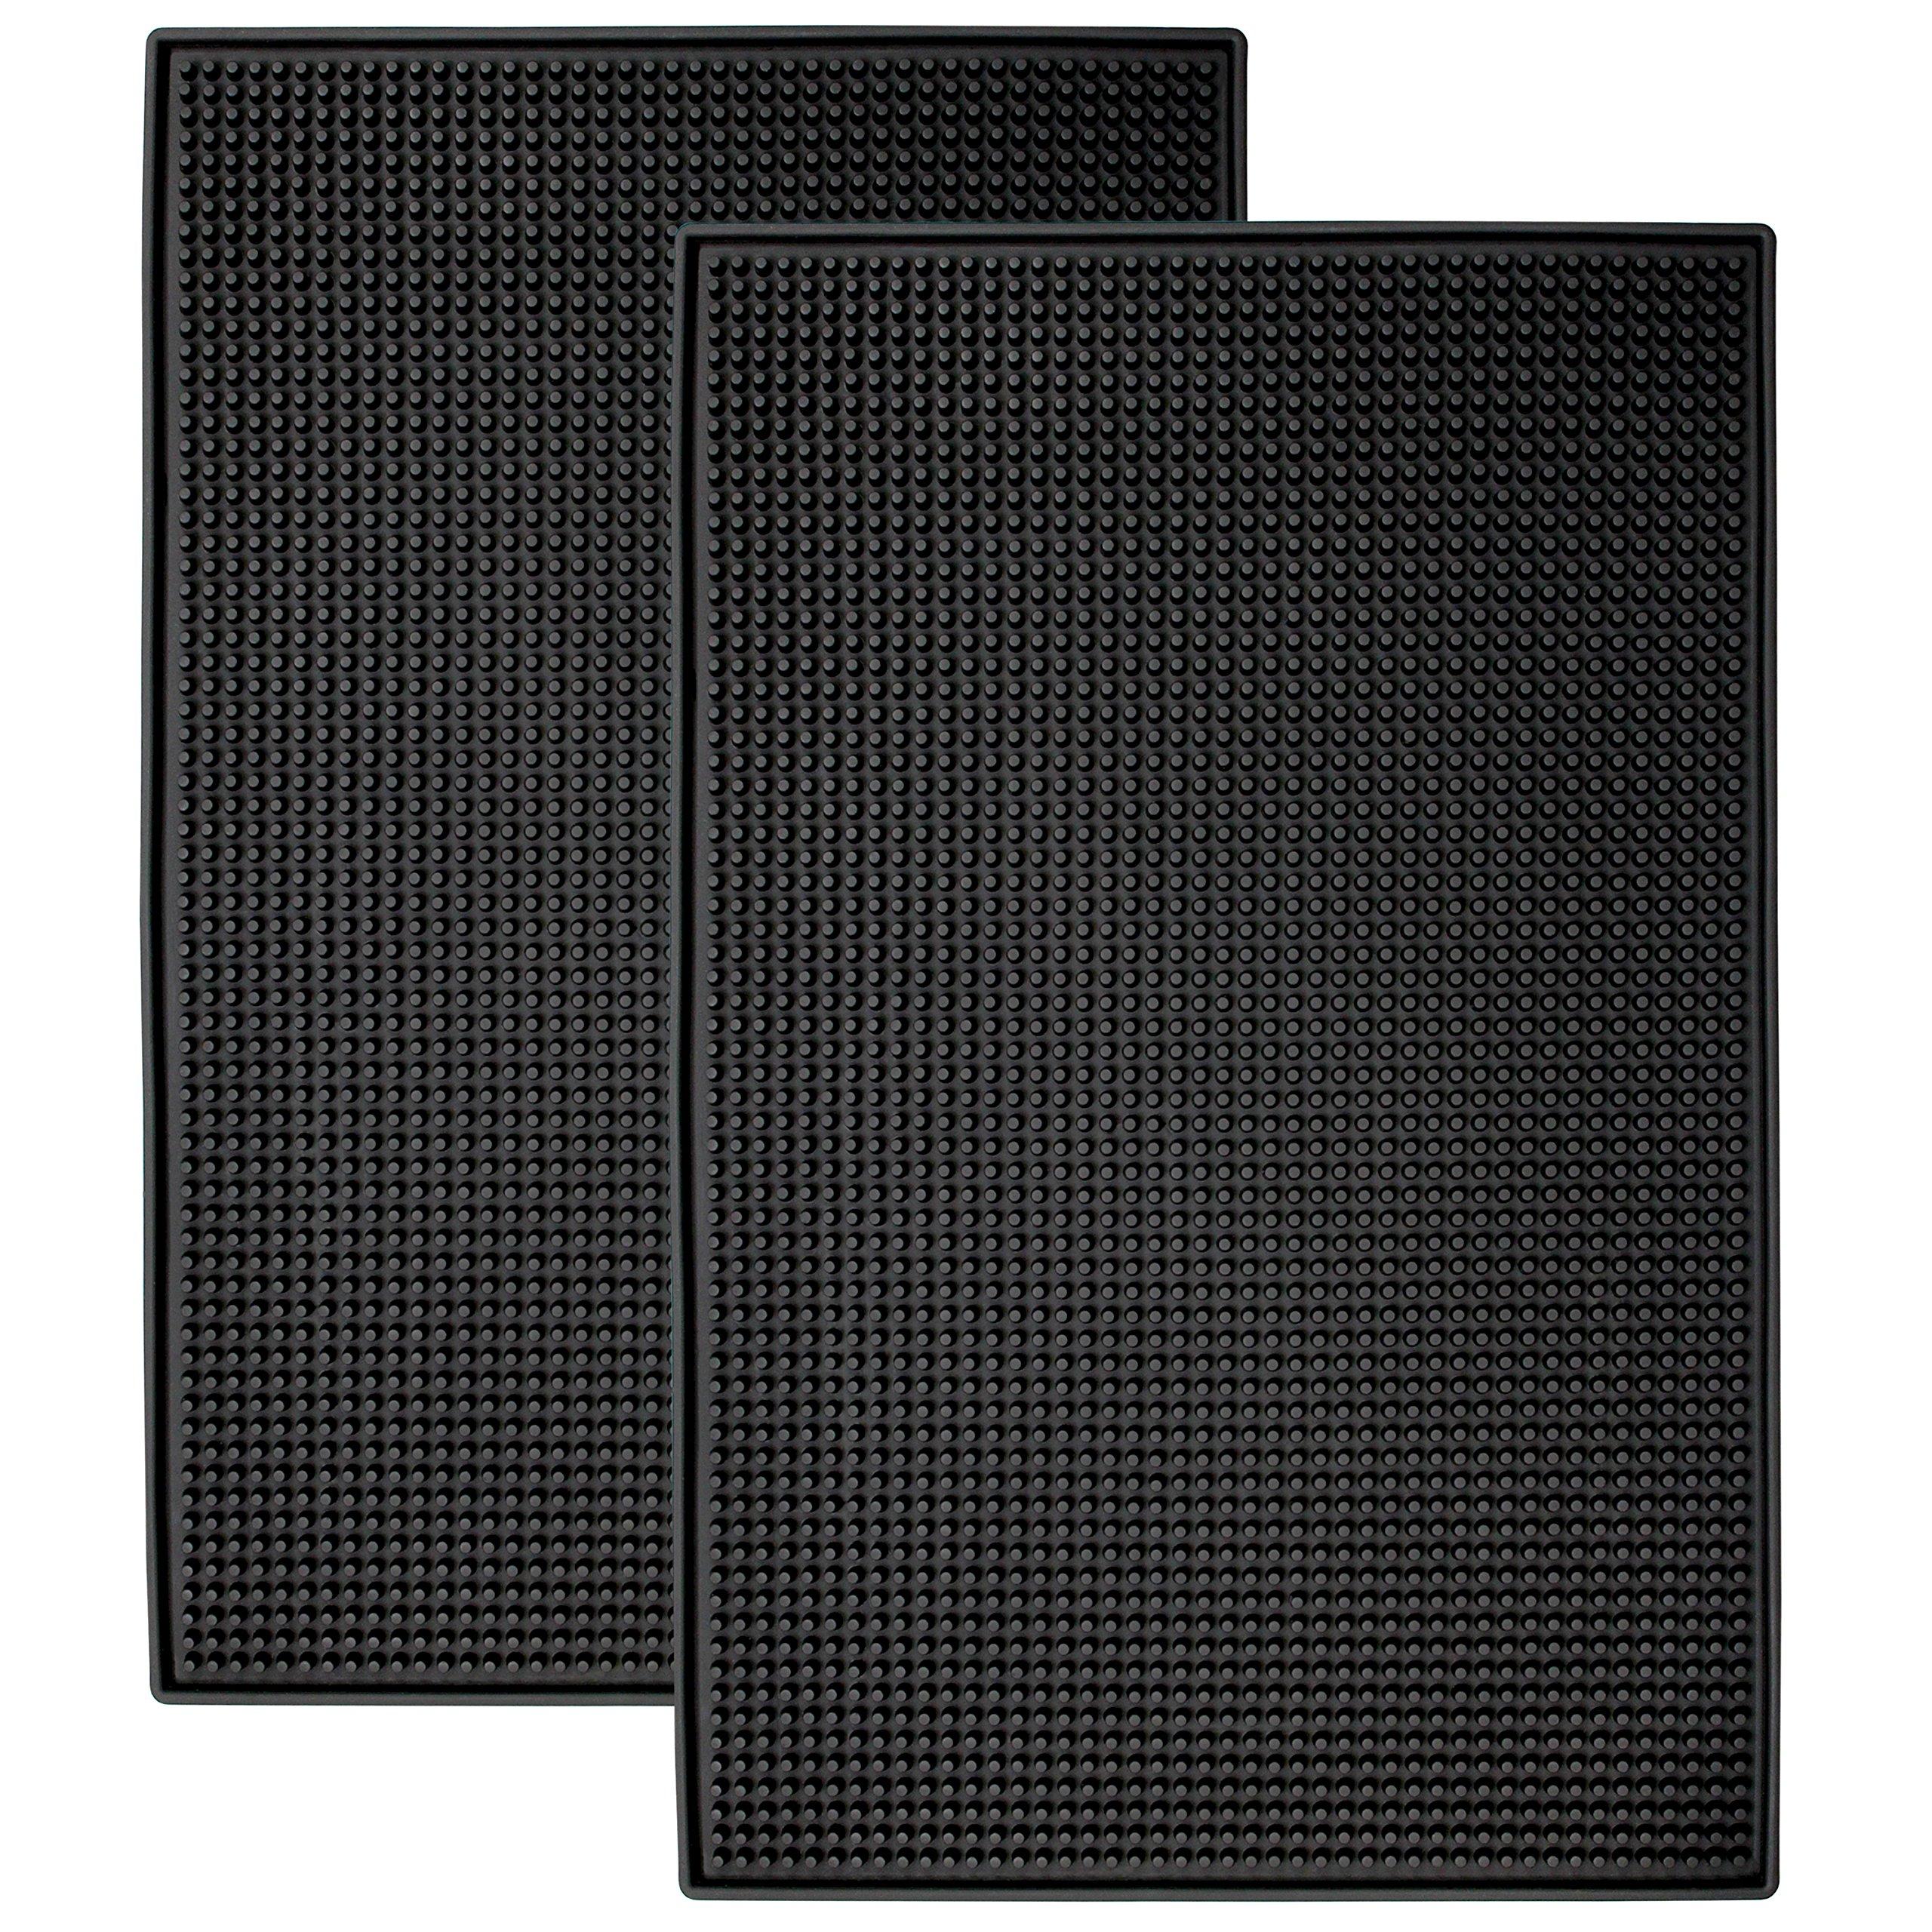 STS S&T 428001 Heavy-Duty Rubber Bar Mats - 11.9'' x 17.8'', Black, 2PK, x .4'' by STS